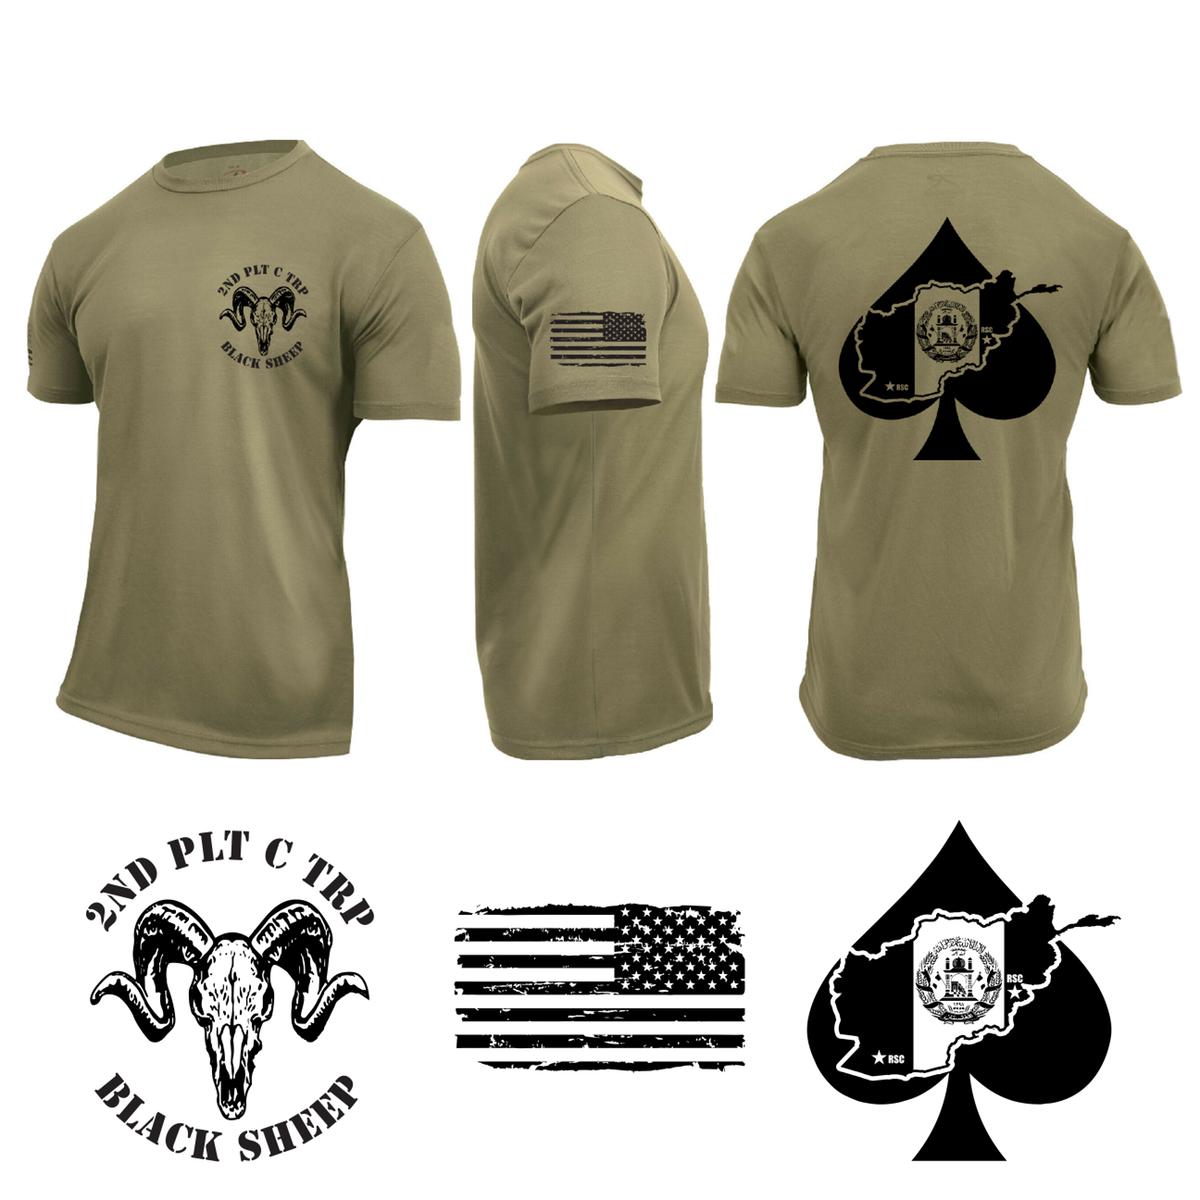 2nd PLT T-shirts